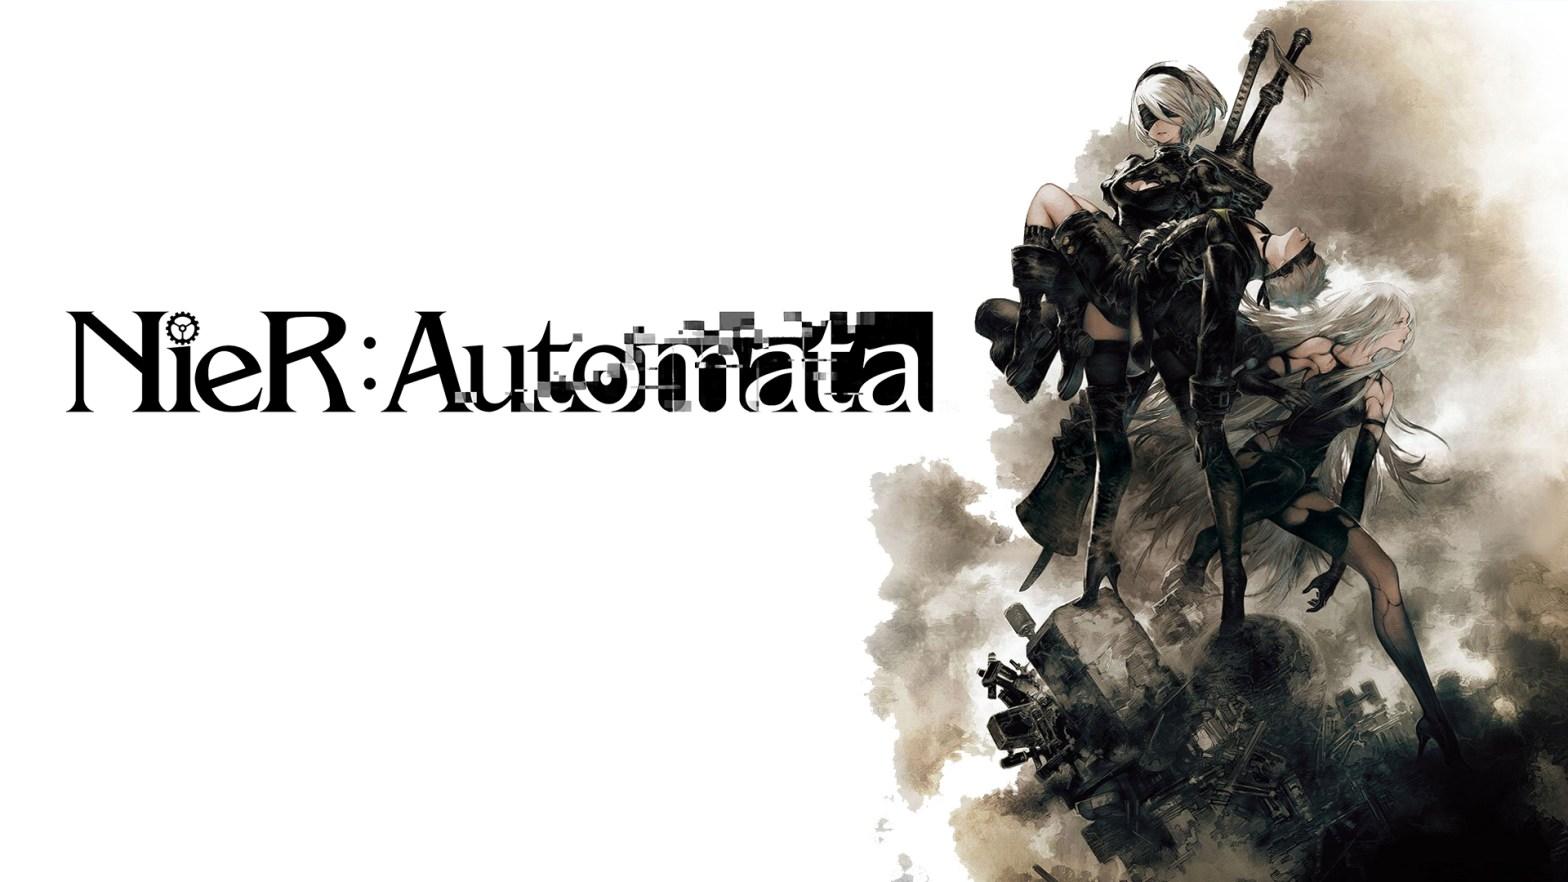 NieR: Automata Has Crossed 4 Million Copies Shipped